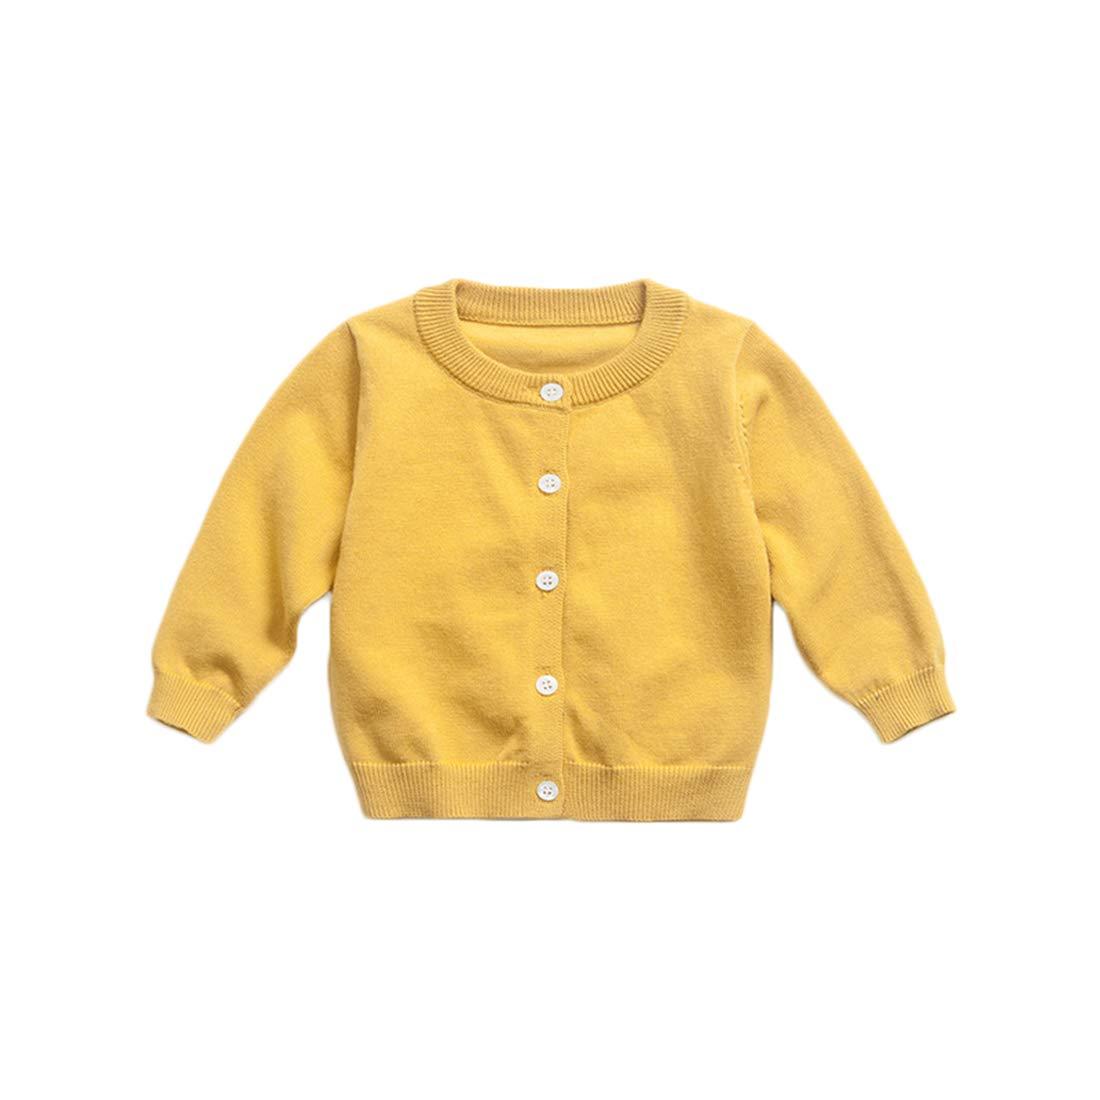 PanpanBox Toddler Cardigan Plain Sweater Jacket Long Sleeved Blouse Basic Spring Autumn Tops Baby Girl Boy Gilet Age 1-6 Years Old